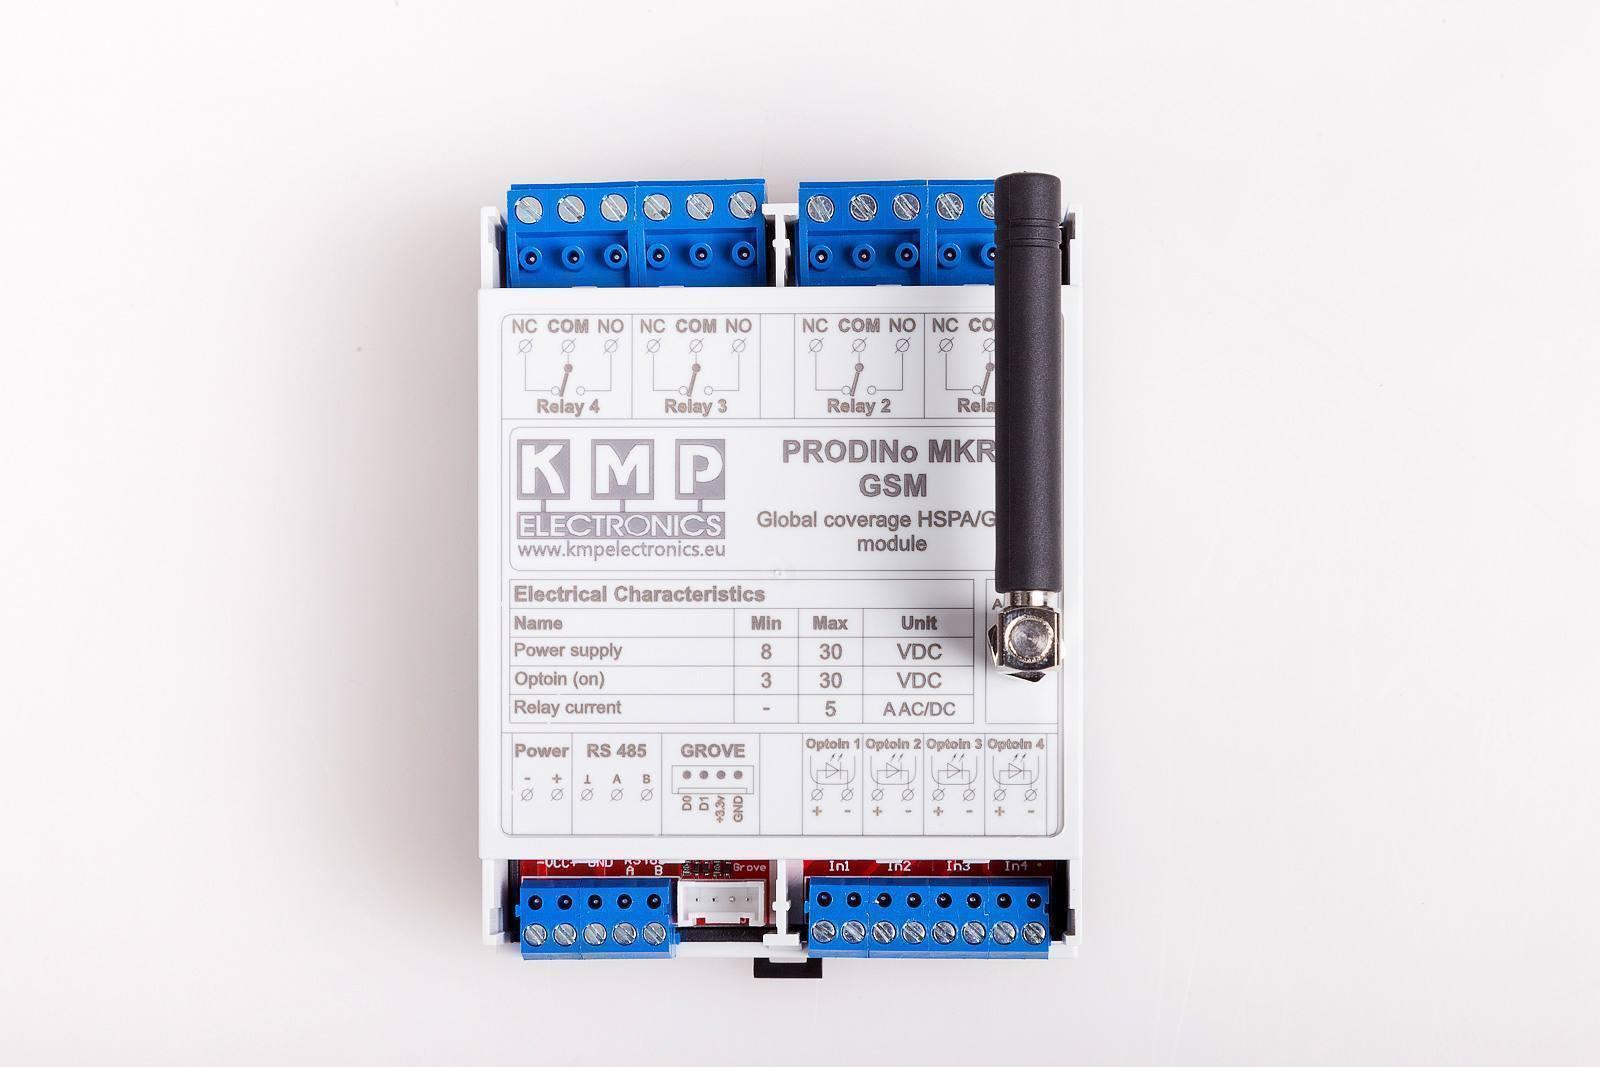 Prodino Mkr Gsm Your Connection Kmp Electronics Ltd Shop Relay No Nc V1 Top